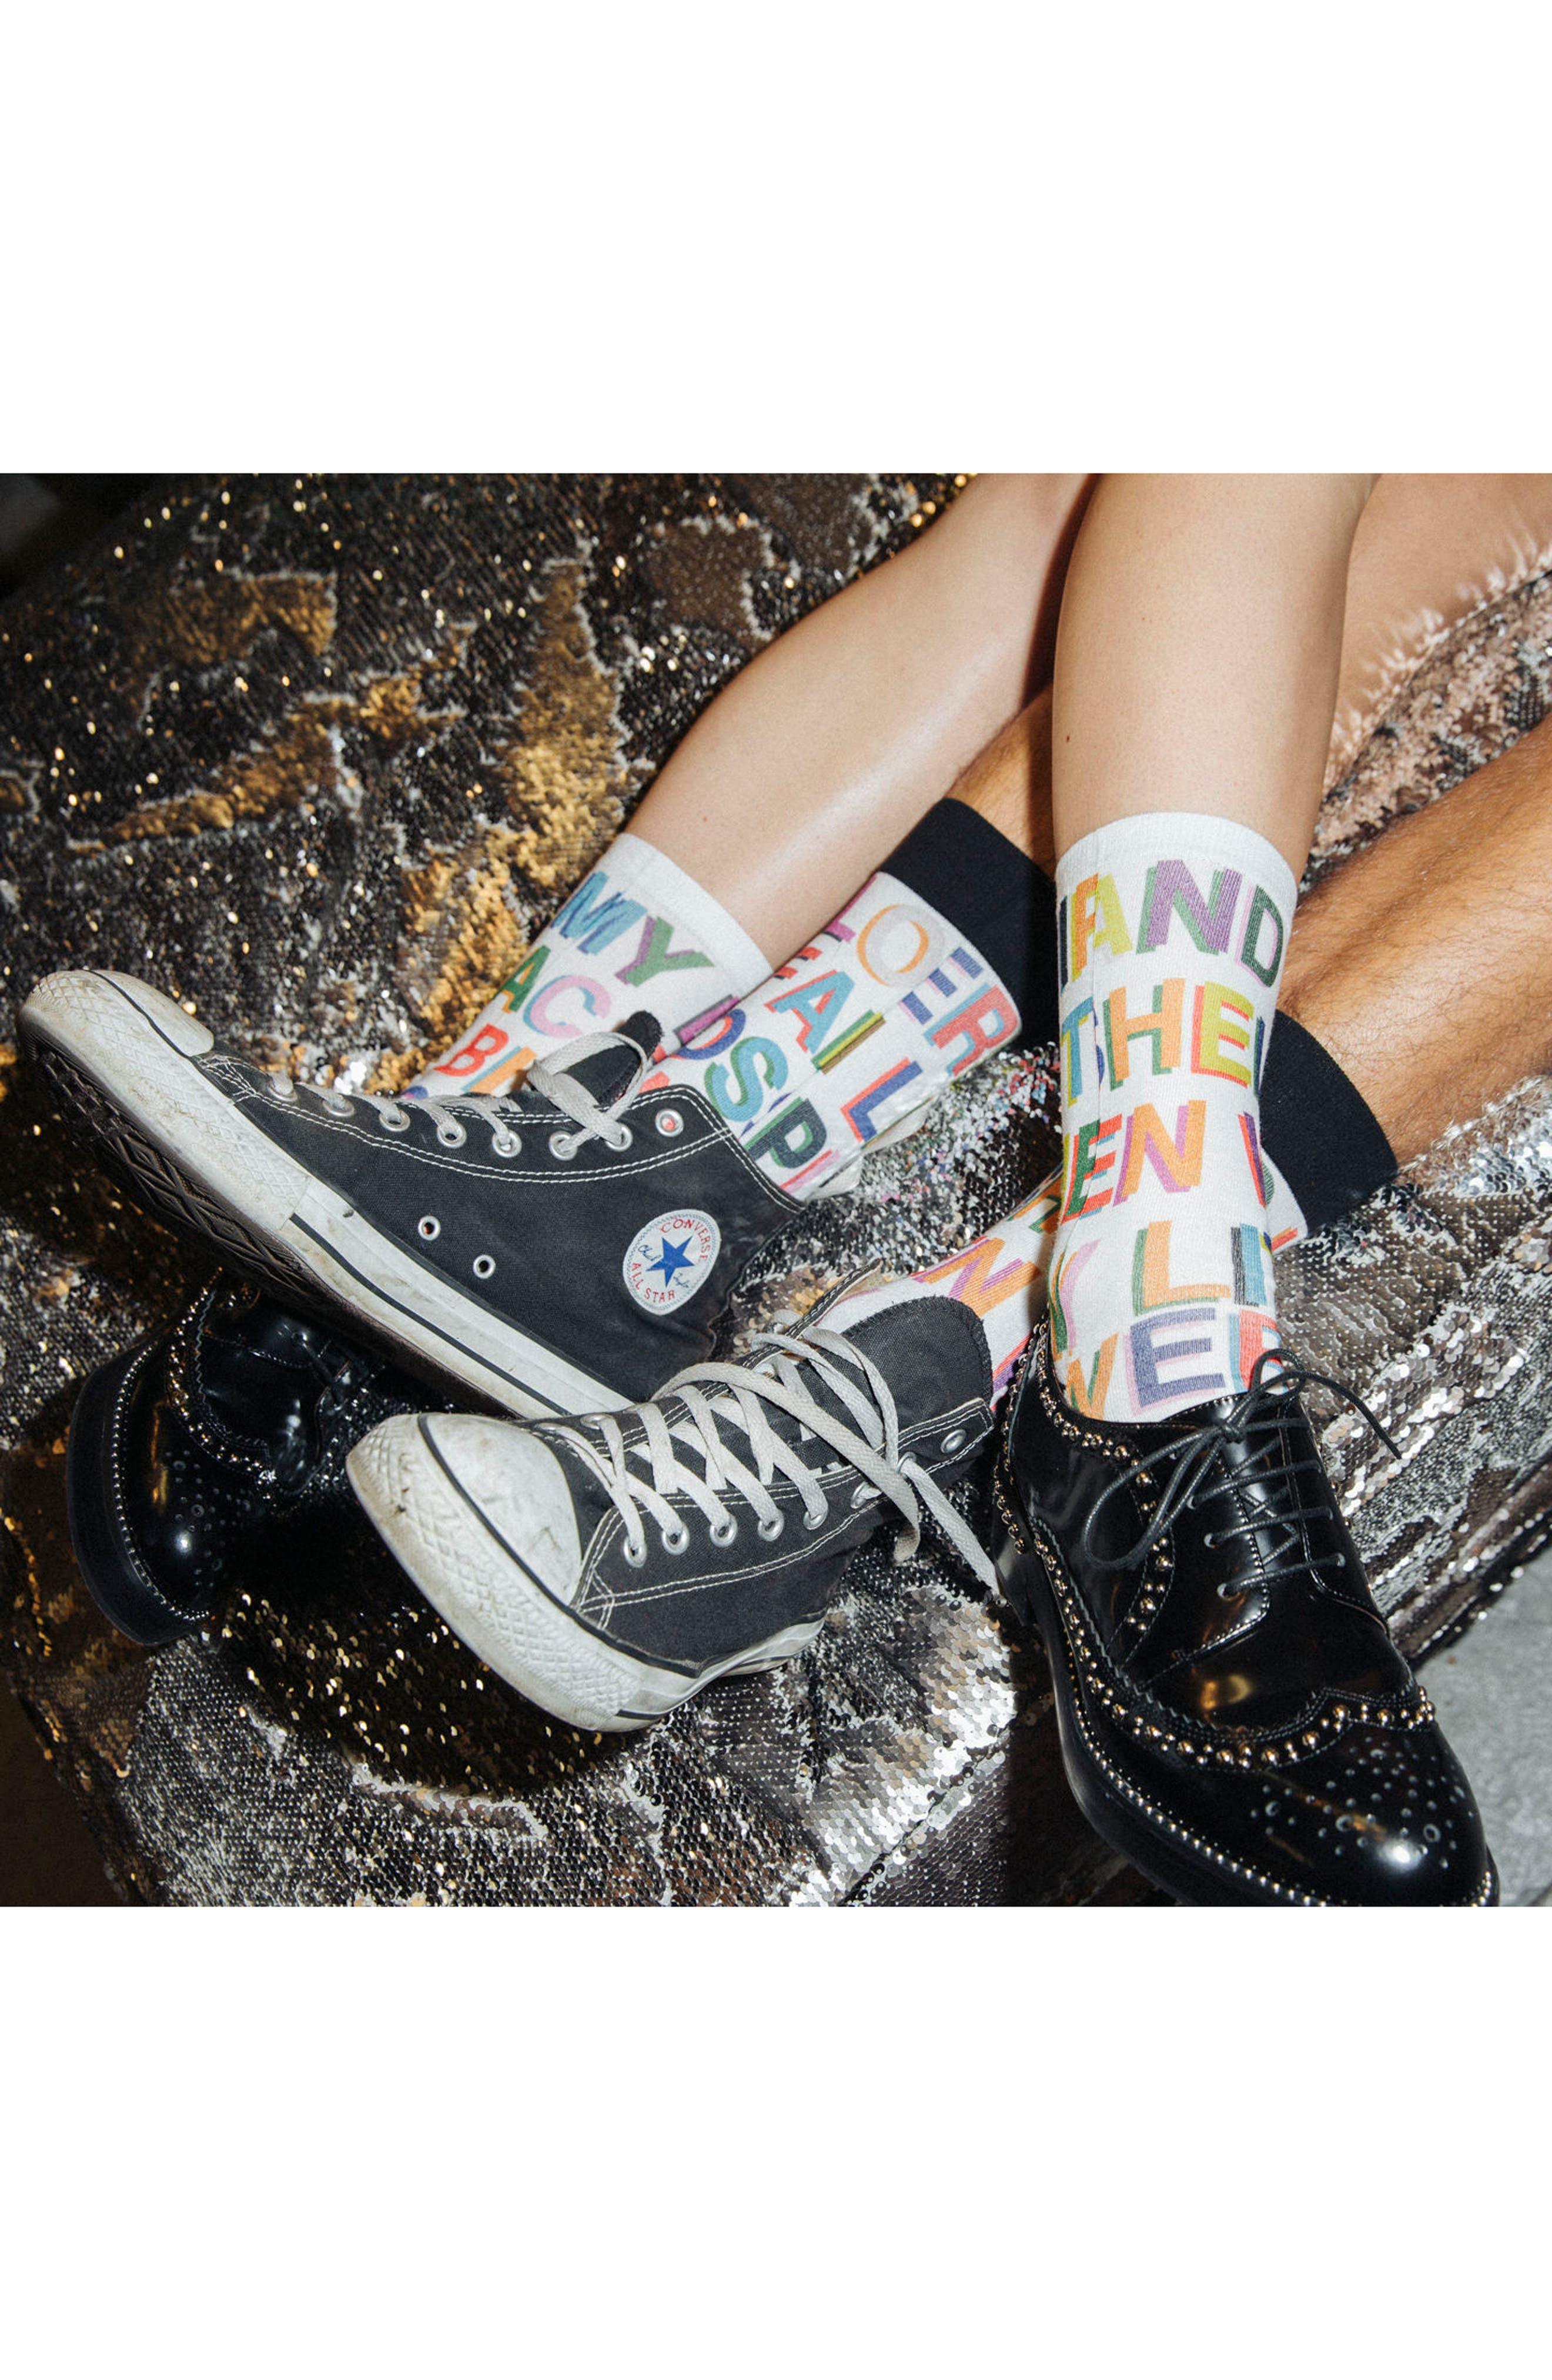 x Libertine Love Letters Crew Socks,                             Alternate thumbnail 4, color,